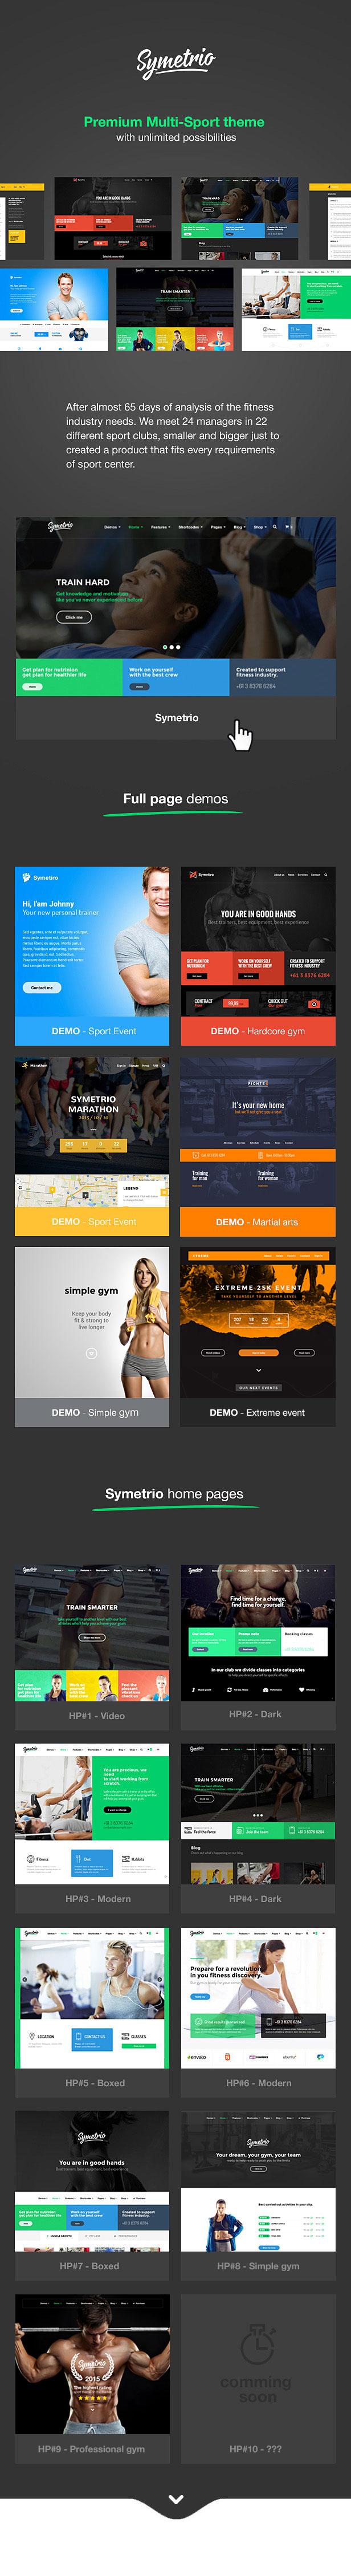 Symetrio - Gym & Fitness WordPress Theme - 1